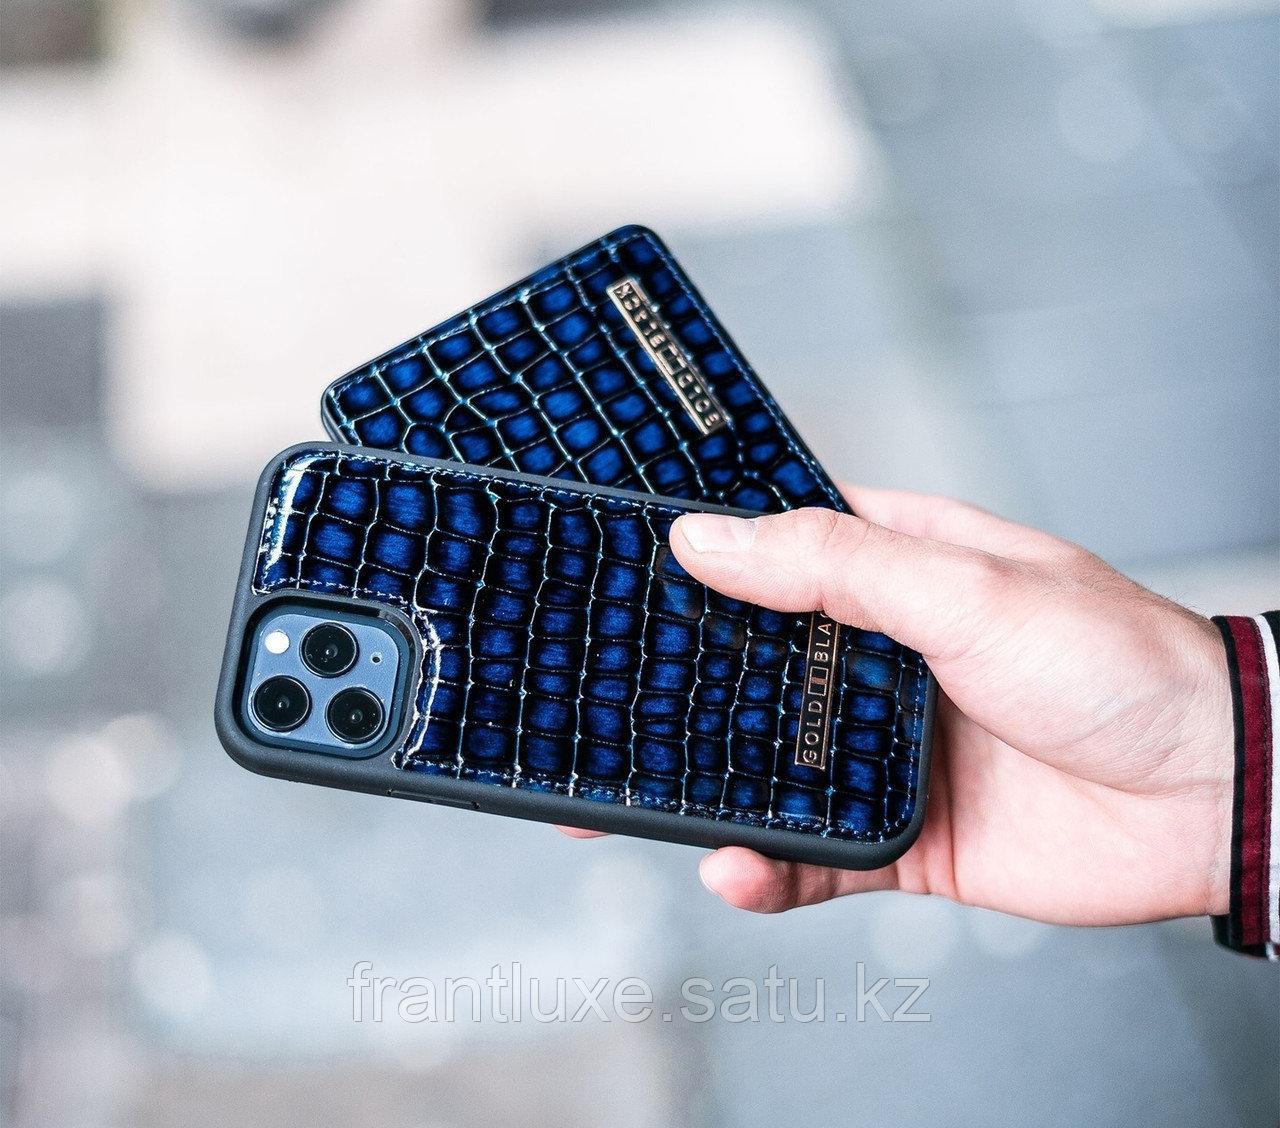 Чехол для телефона iPhone 11 Blue - фото 7